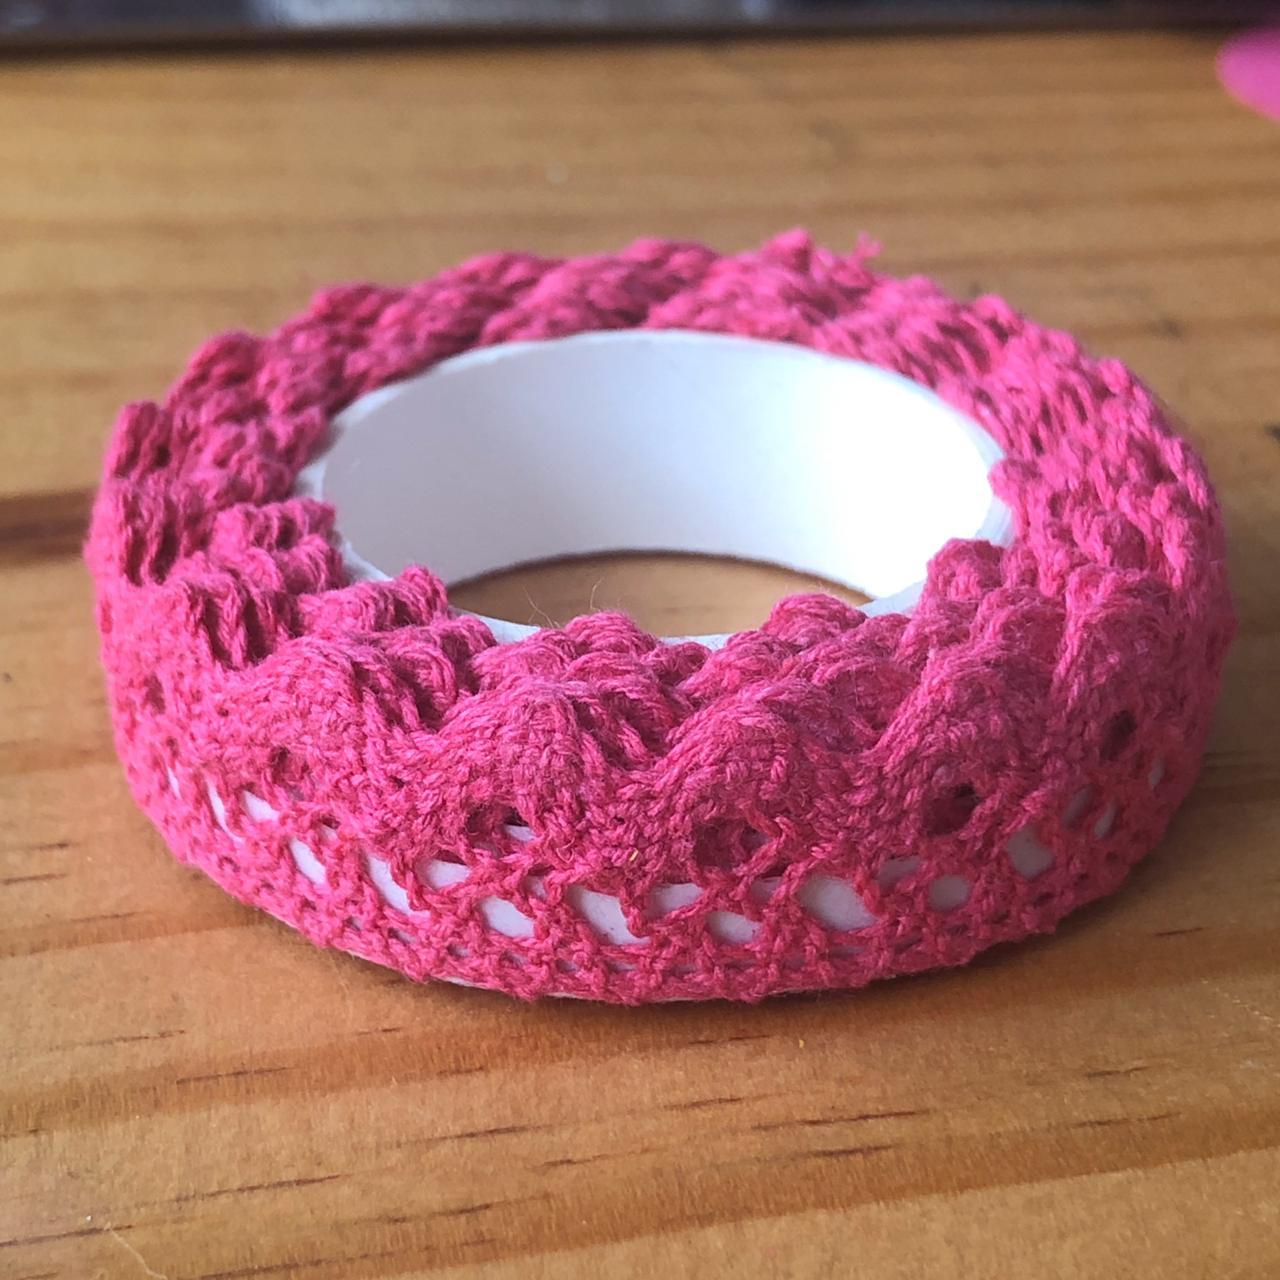 Fita Adesiva Decorativa Rendada - Pink - Art e Montagem (FA05-4)